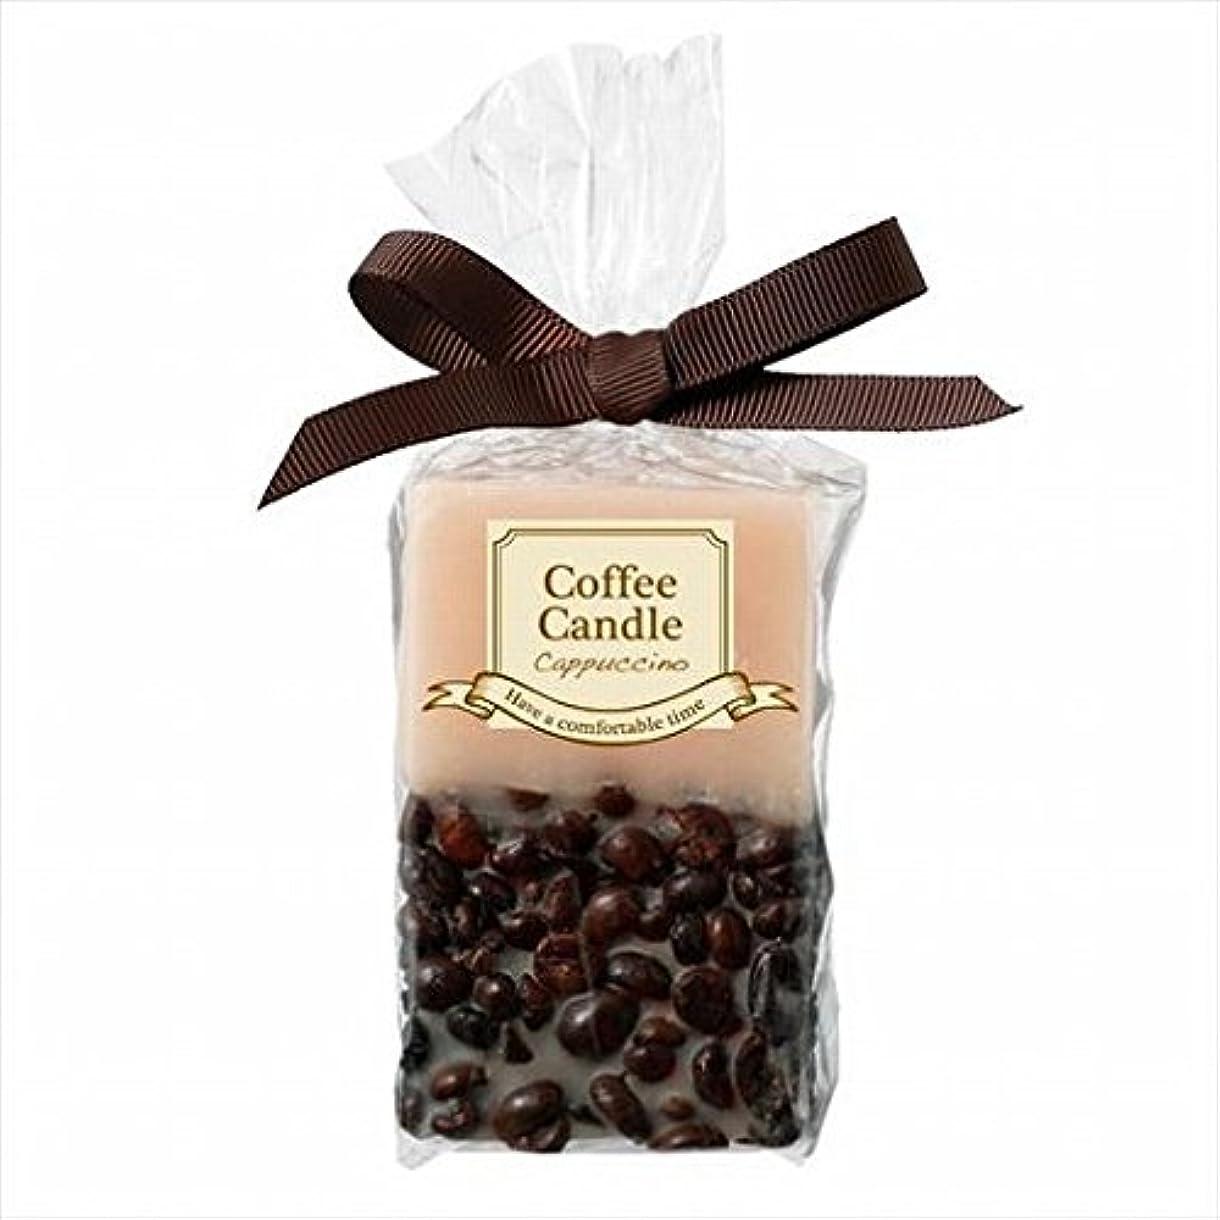 sweets candle(スイーツキャンドル) カフェキャンドル 「 カプチーノ 」 キャンドル 48x48x78mm (A2060520)